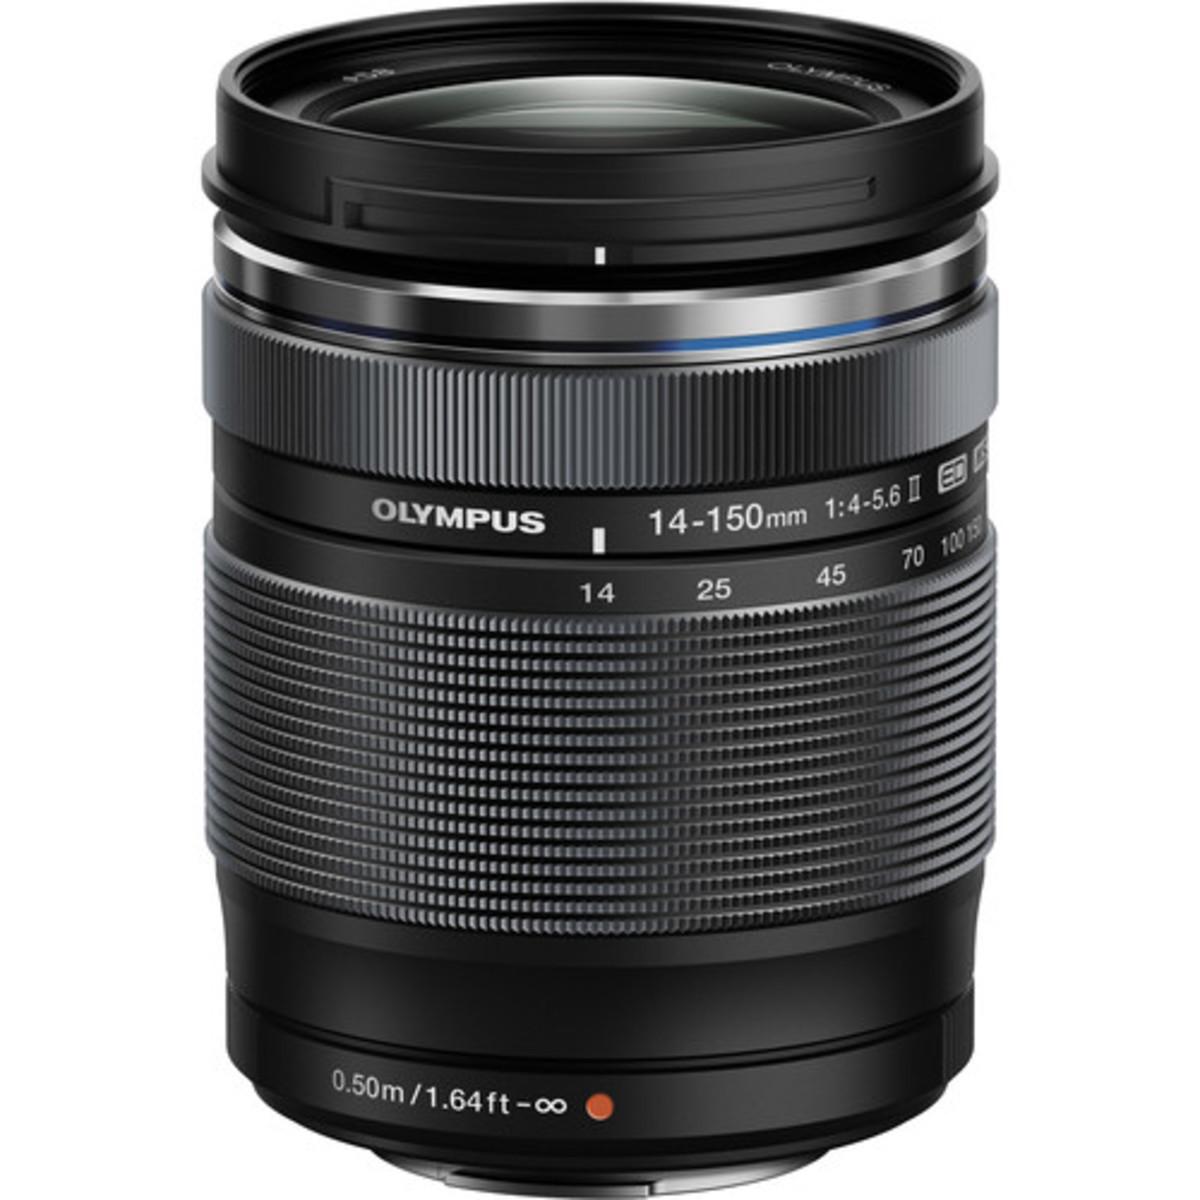 M.Zuiko Digital ED 14-150mm f/4-5.6 II Lens (Parallel imported)